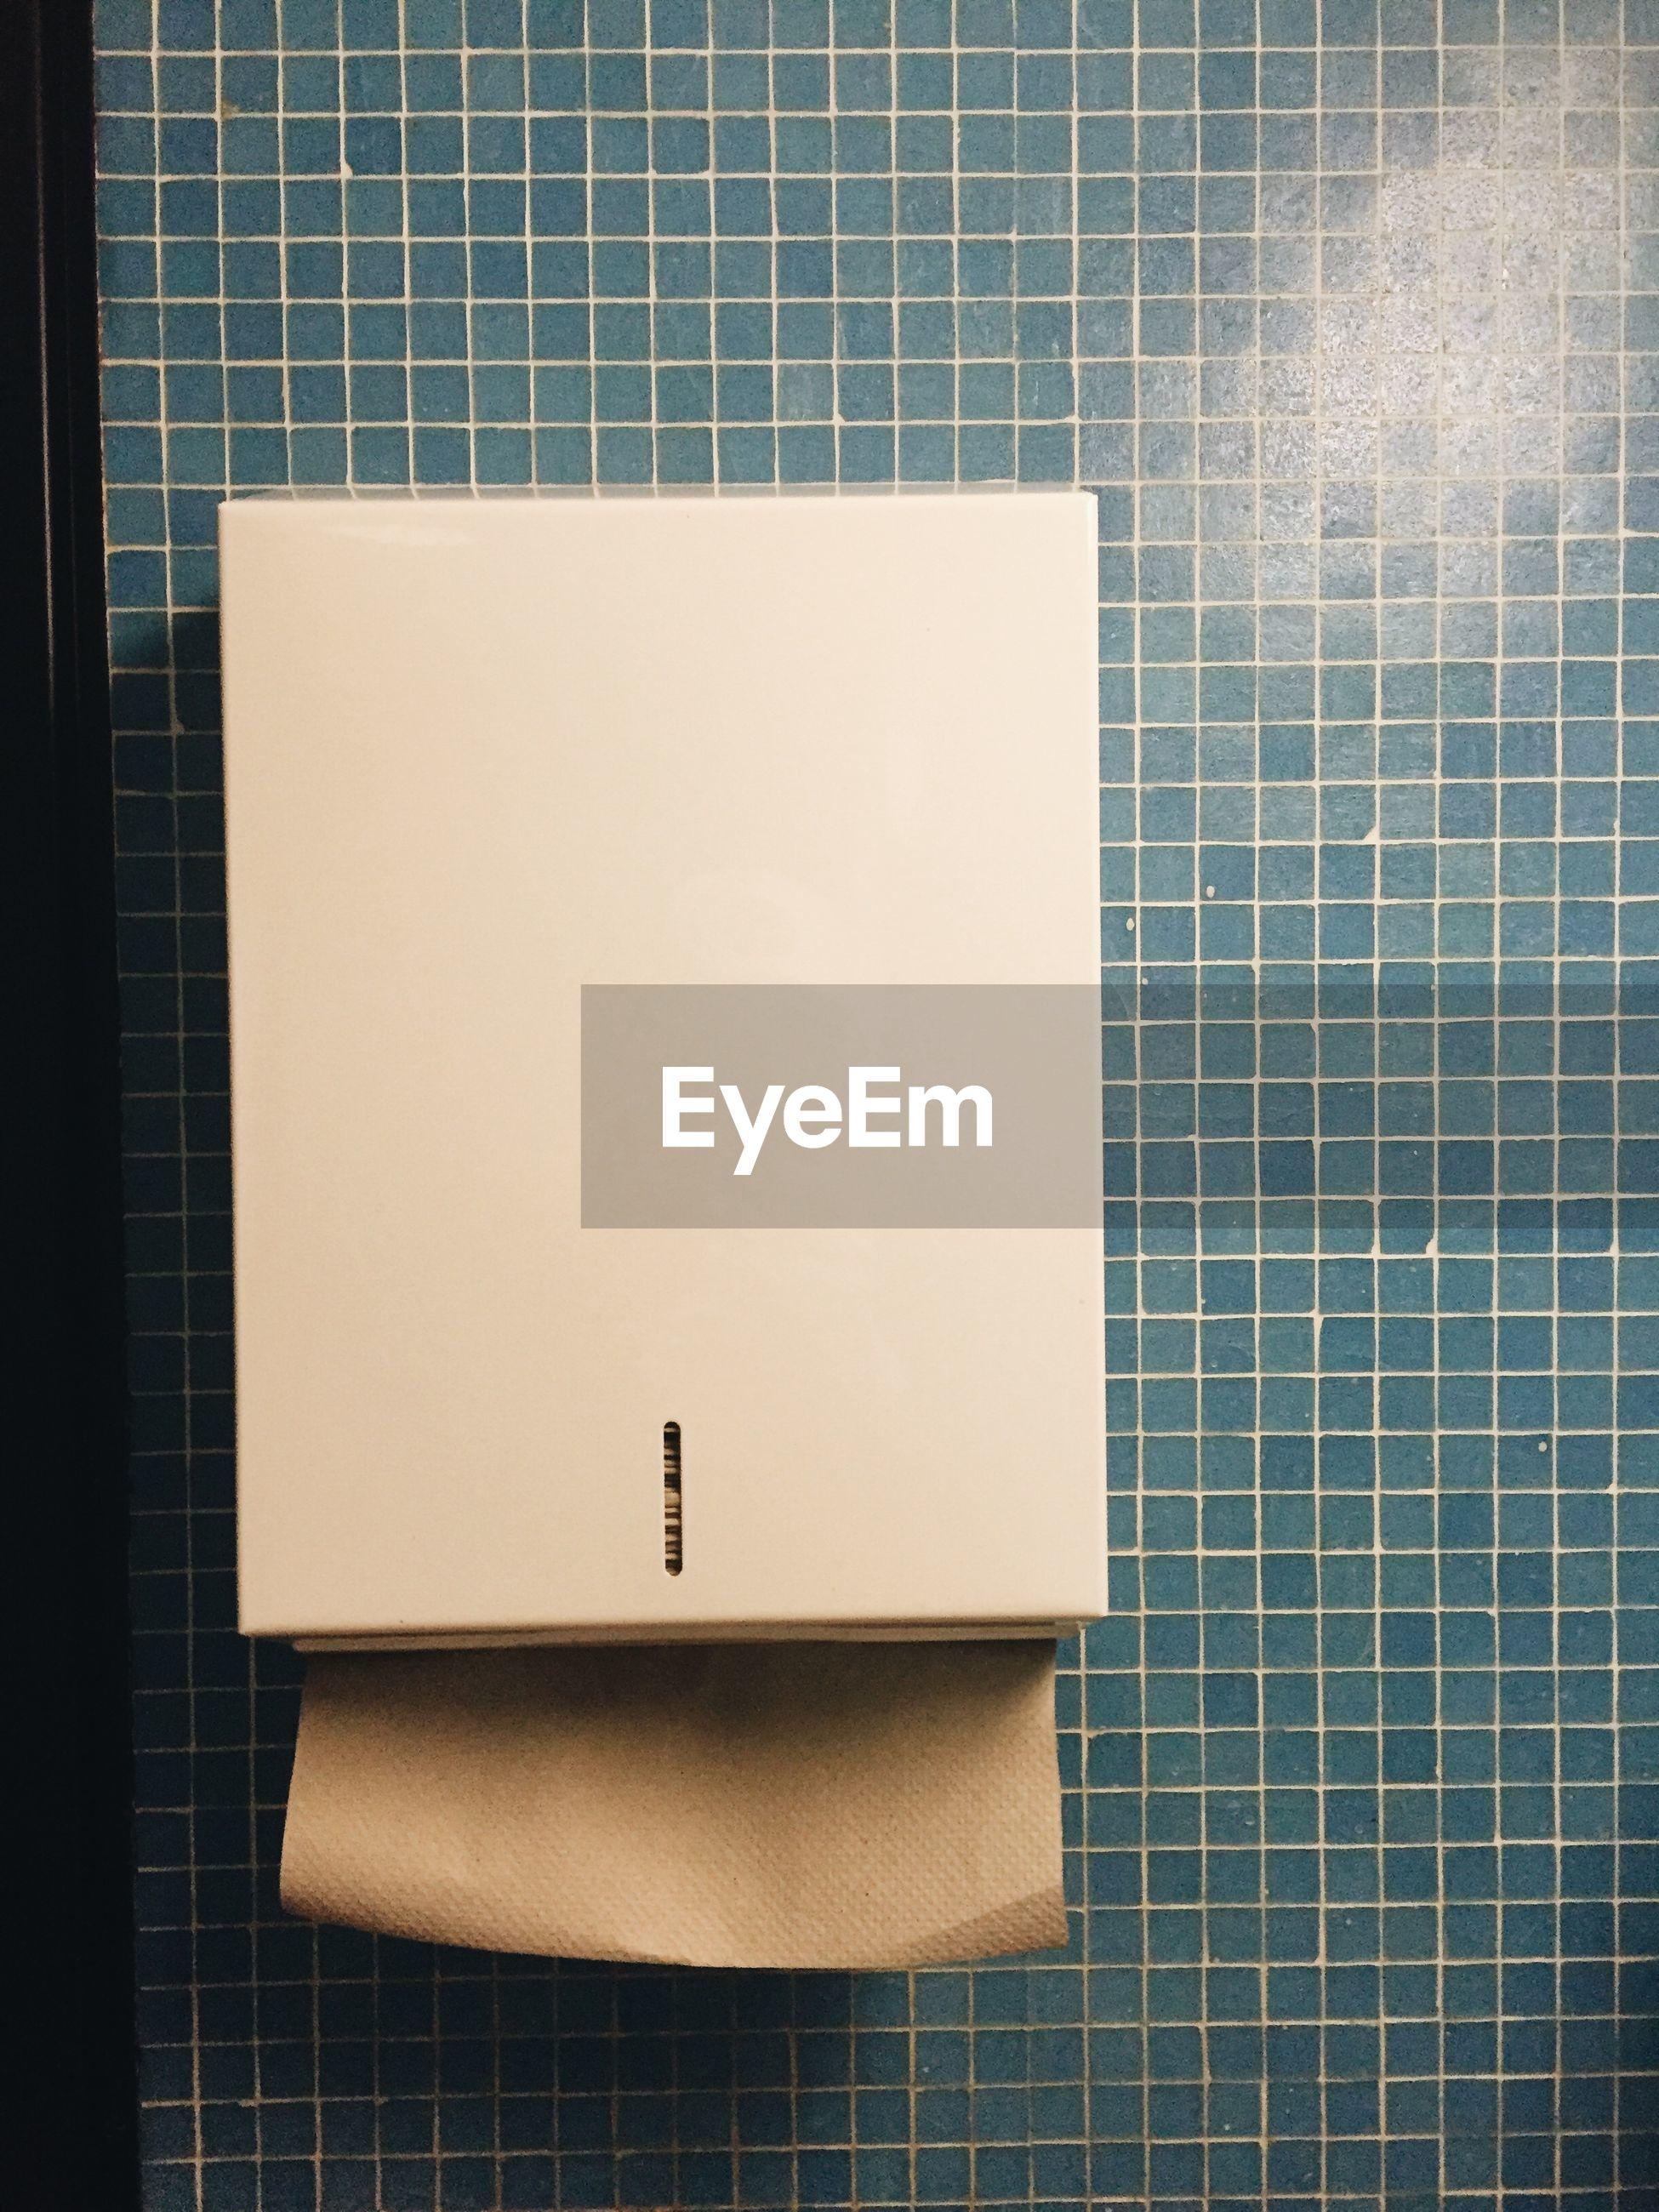 Towel dispenser on tiled wall in bathroom